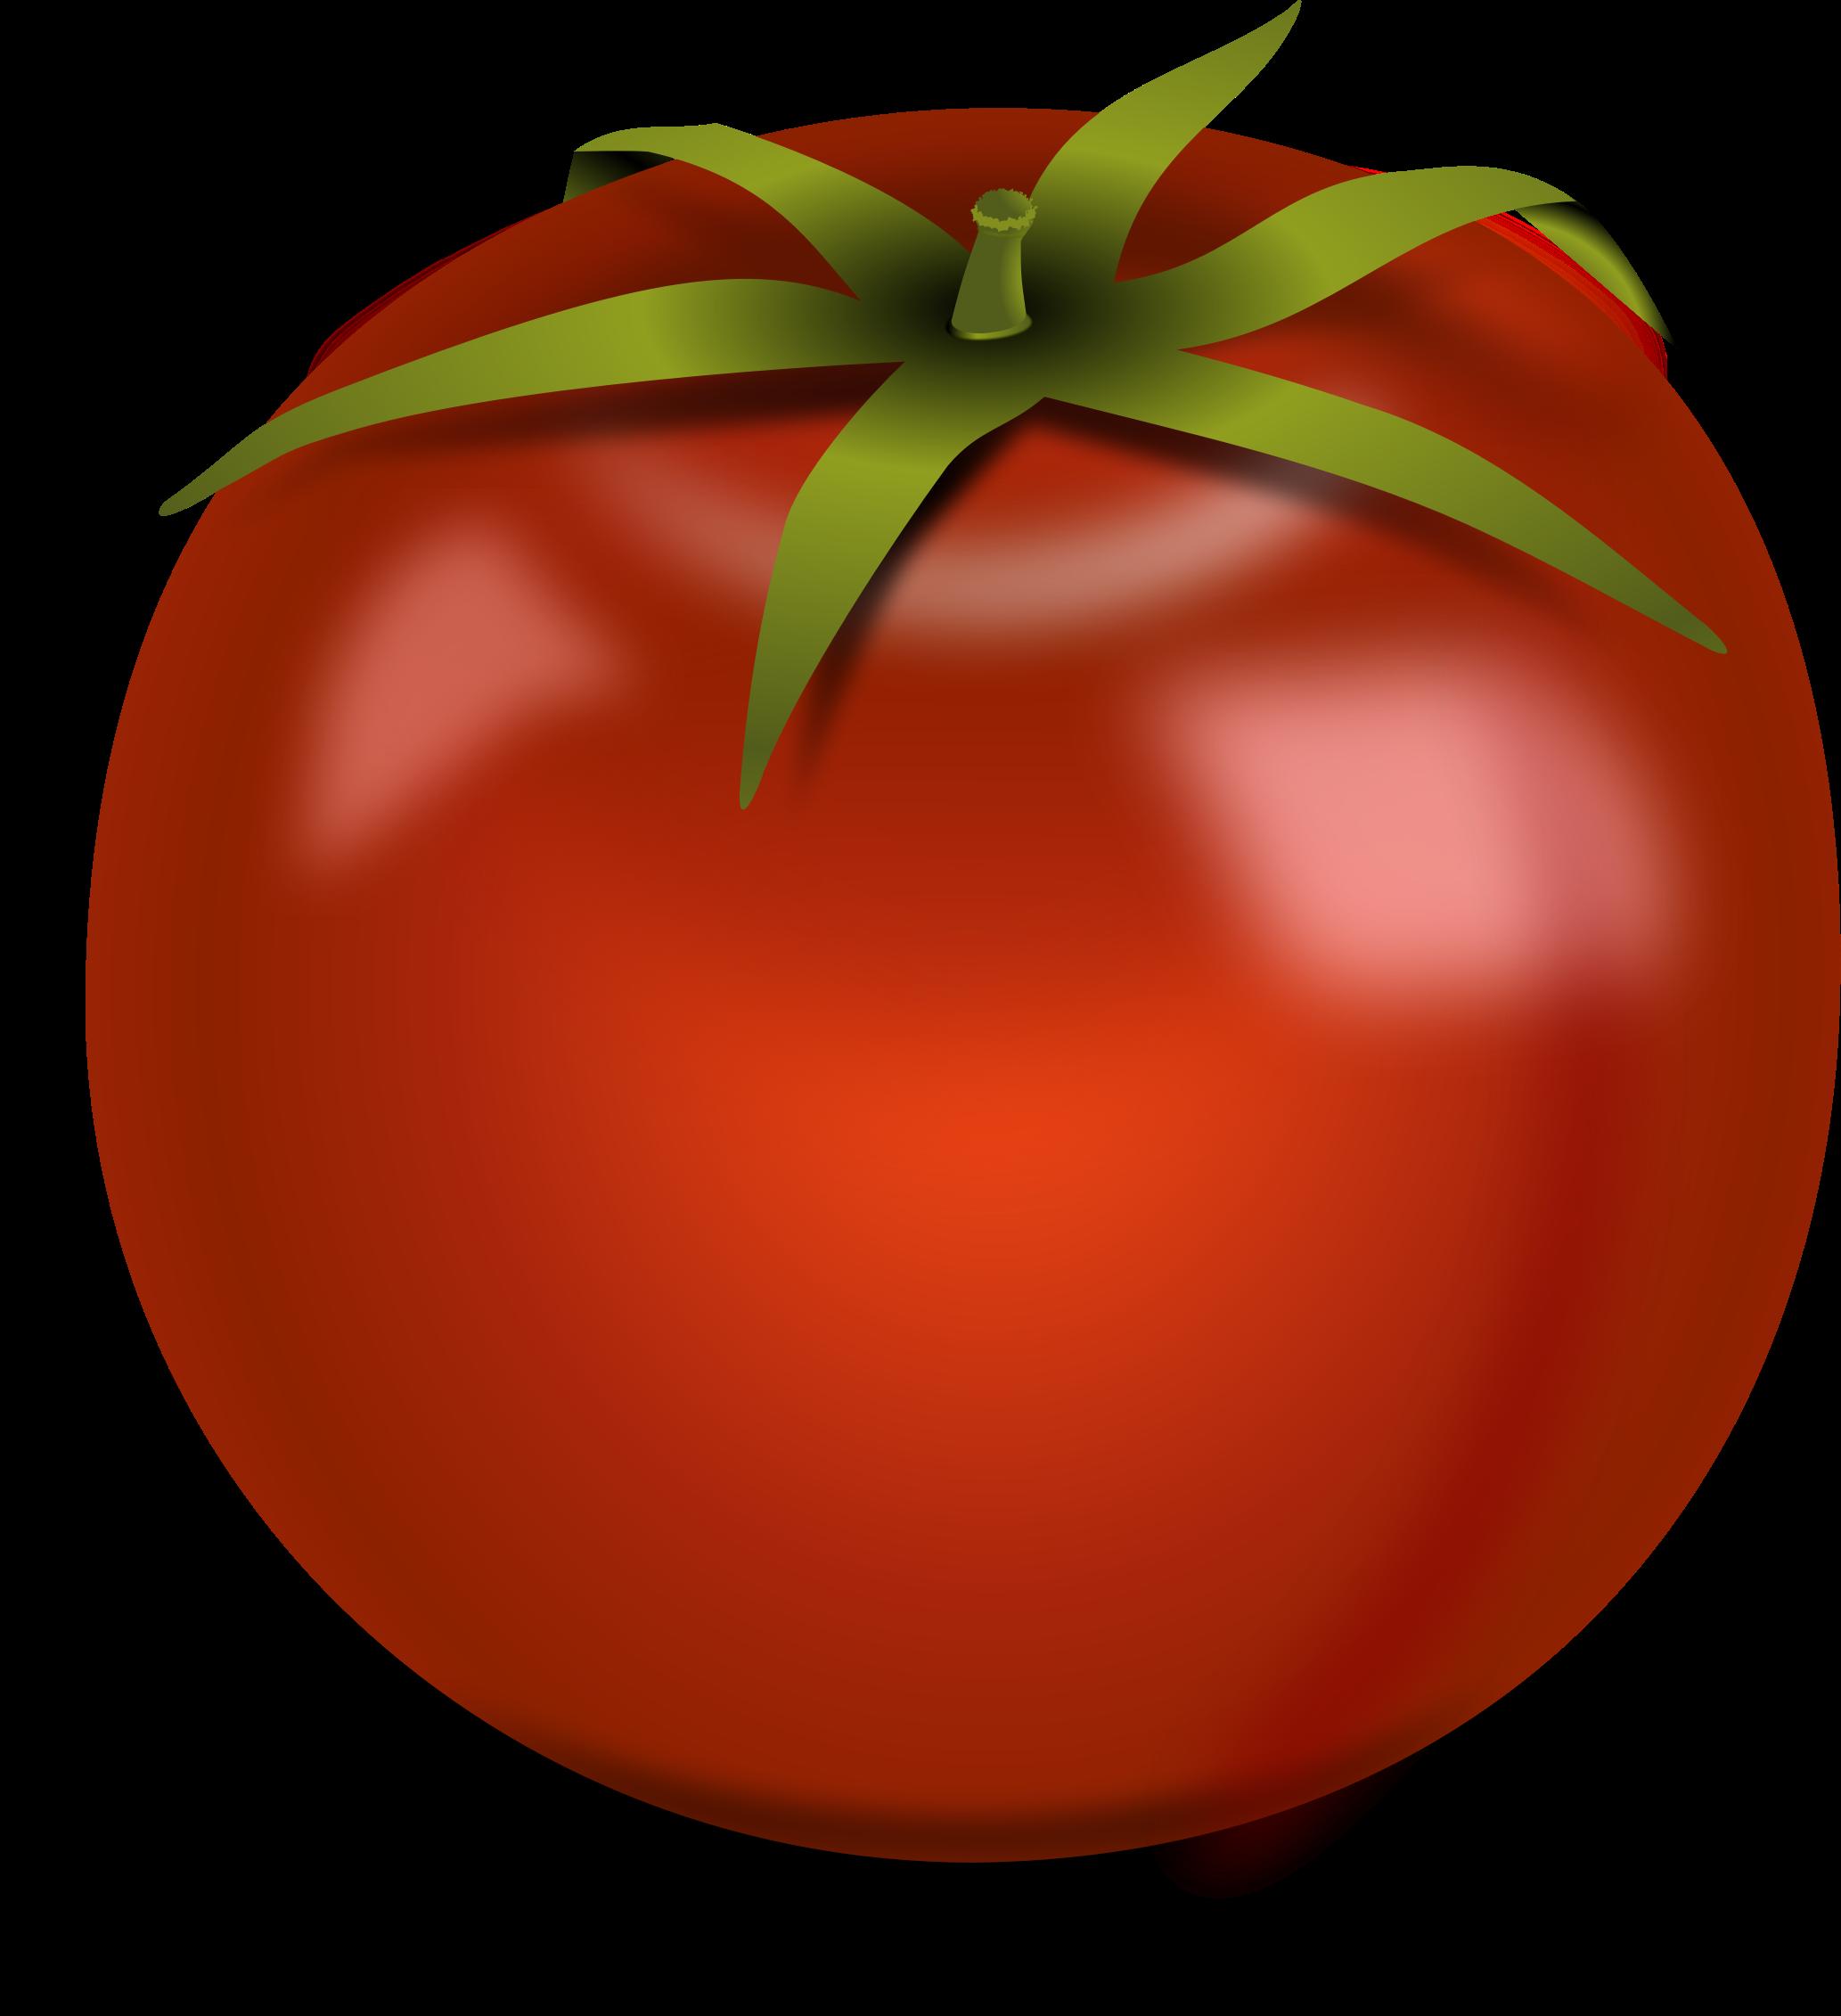 tomato, pomidoras, food by Keistutis